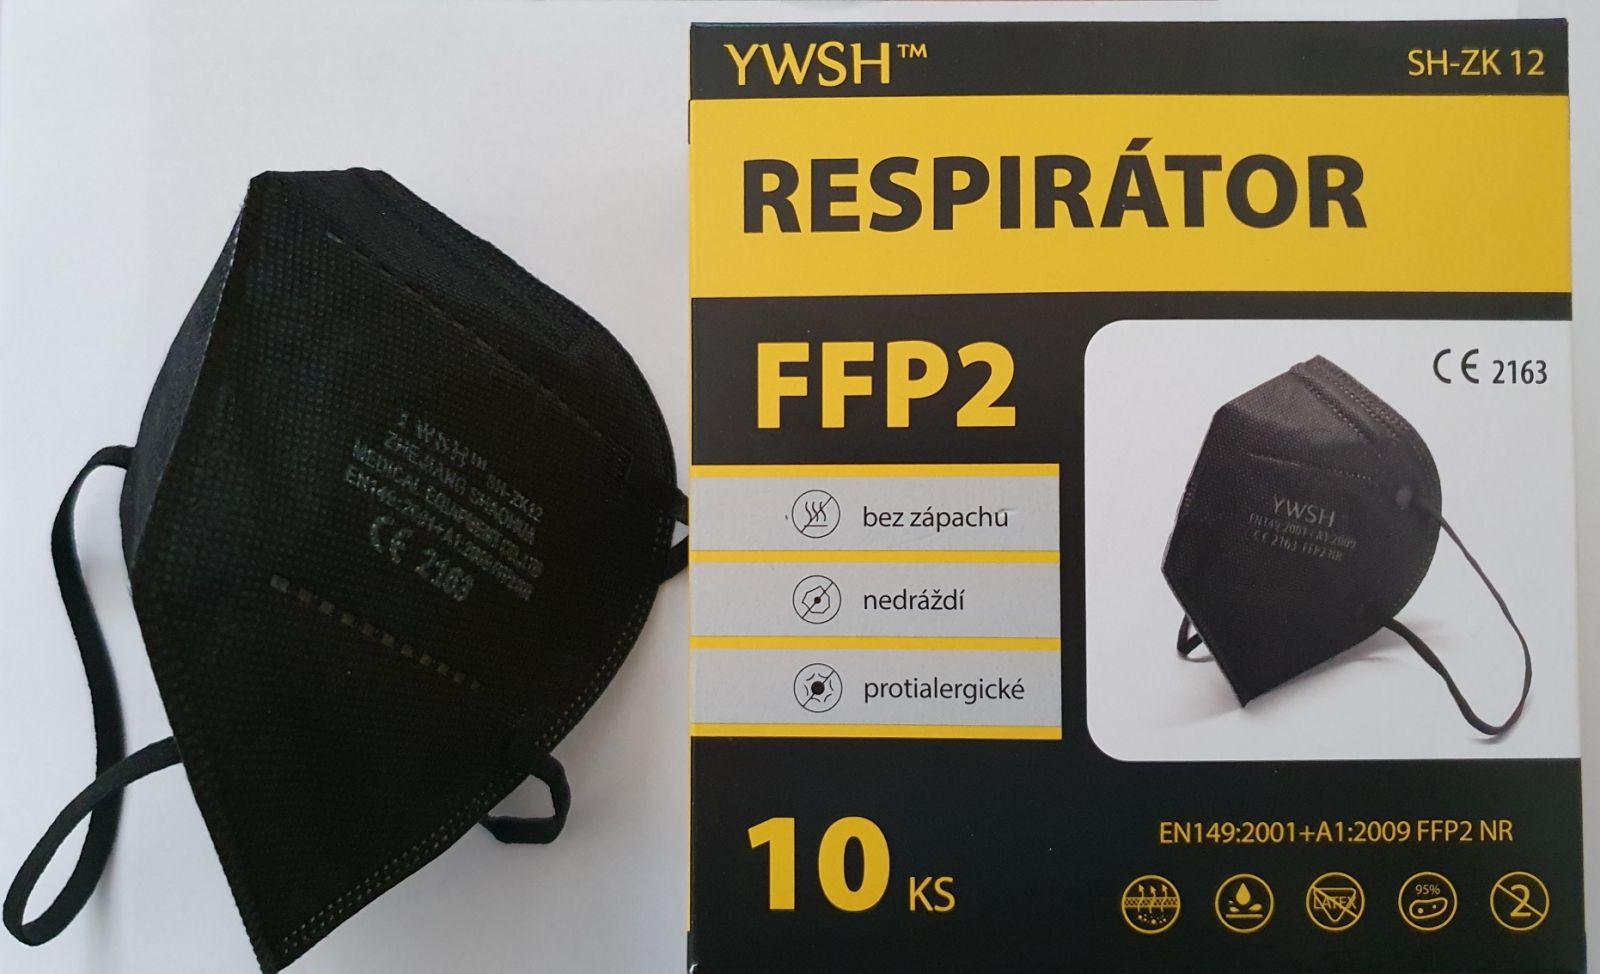 YWSH Respirátor FFP2 10 ks - Černý